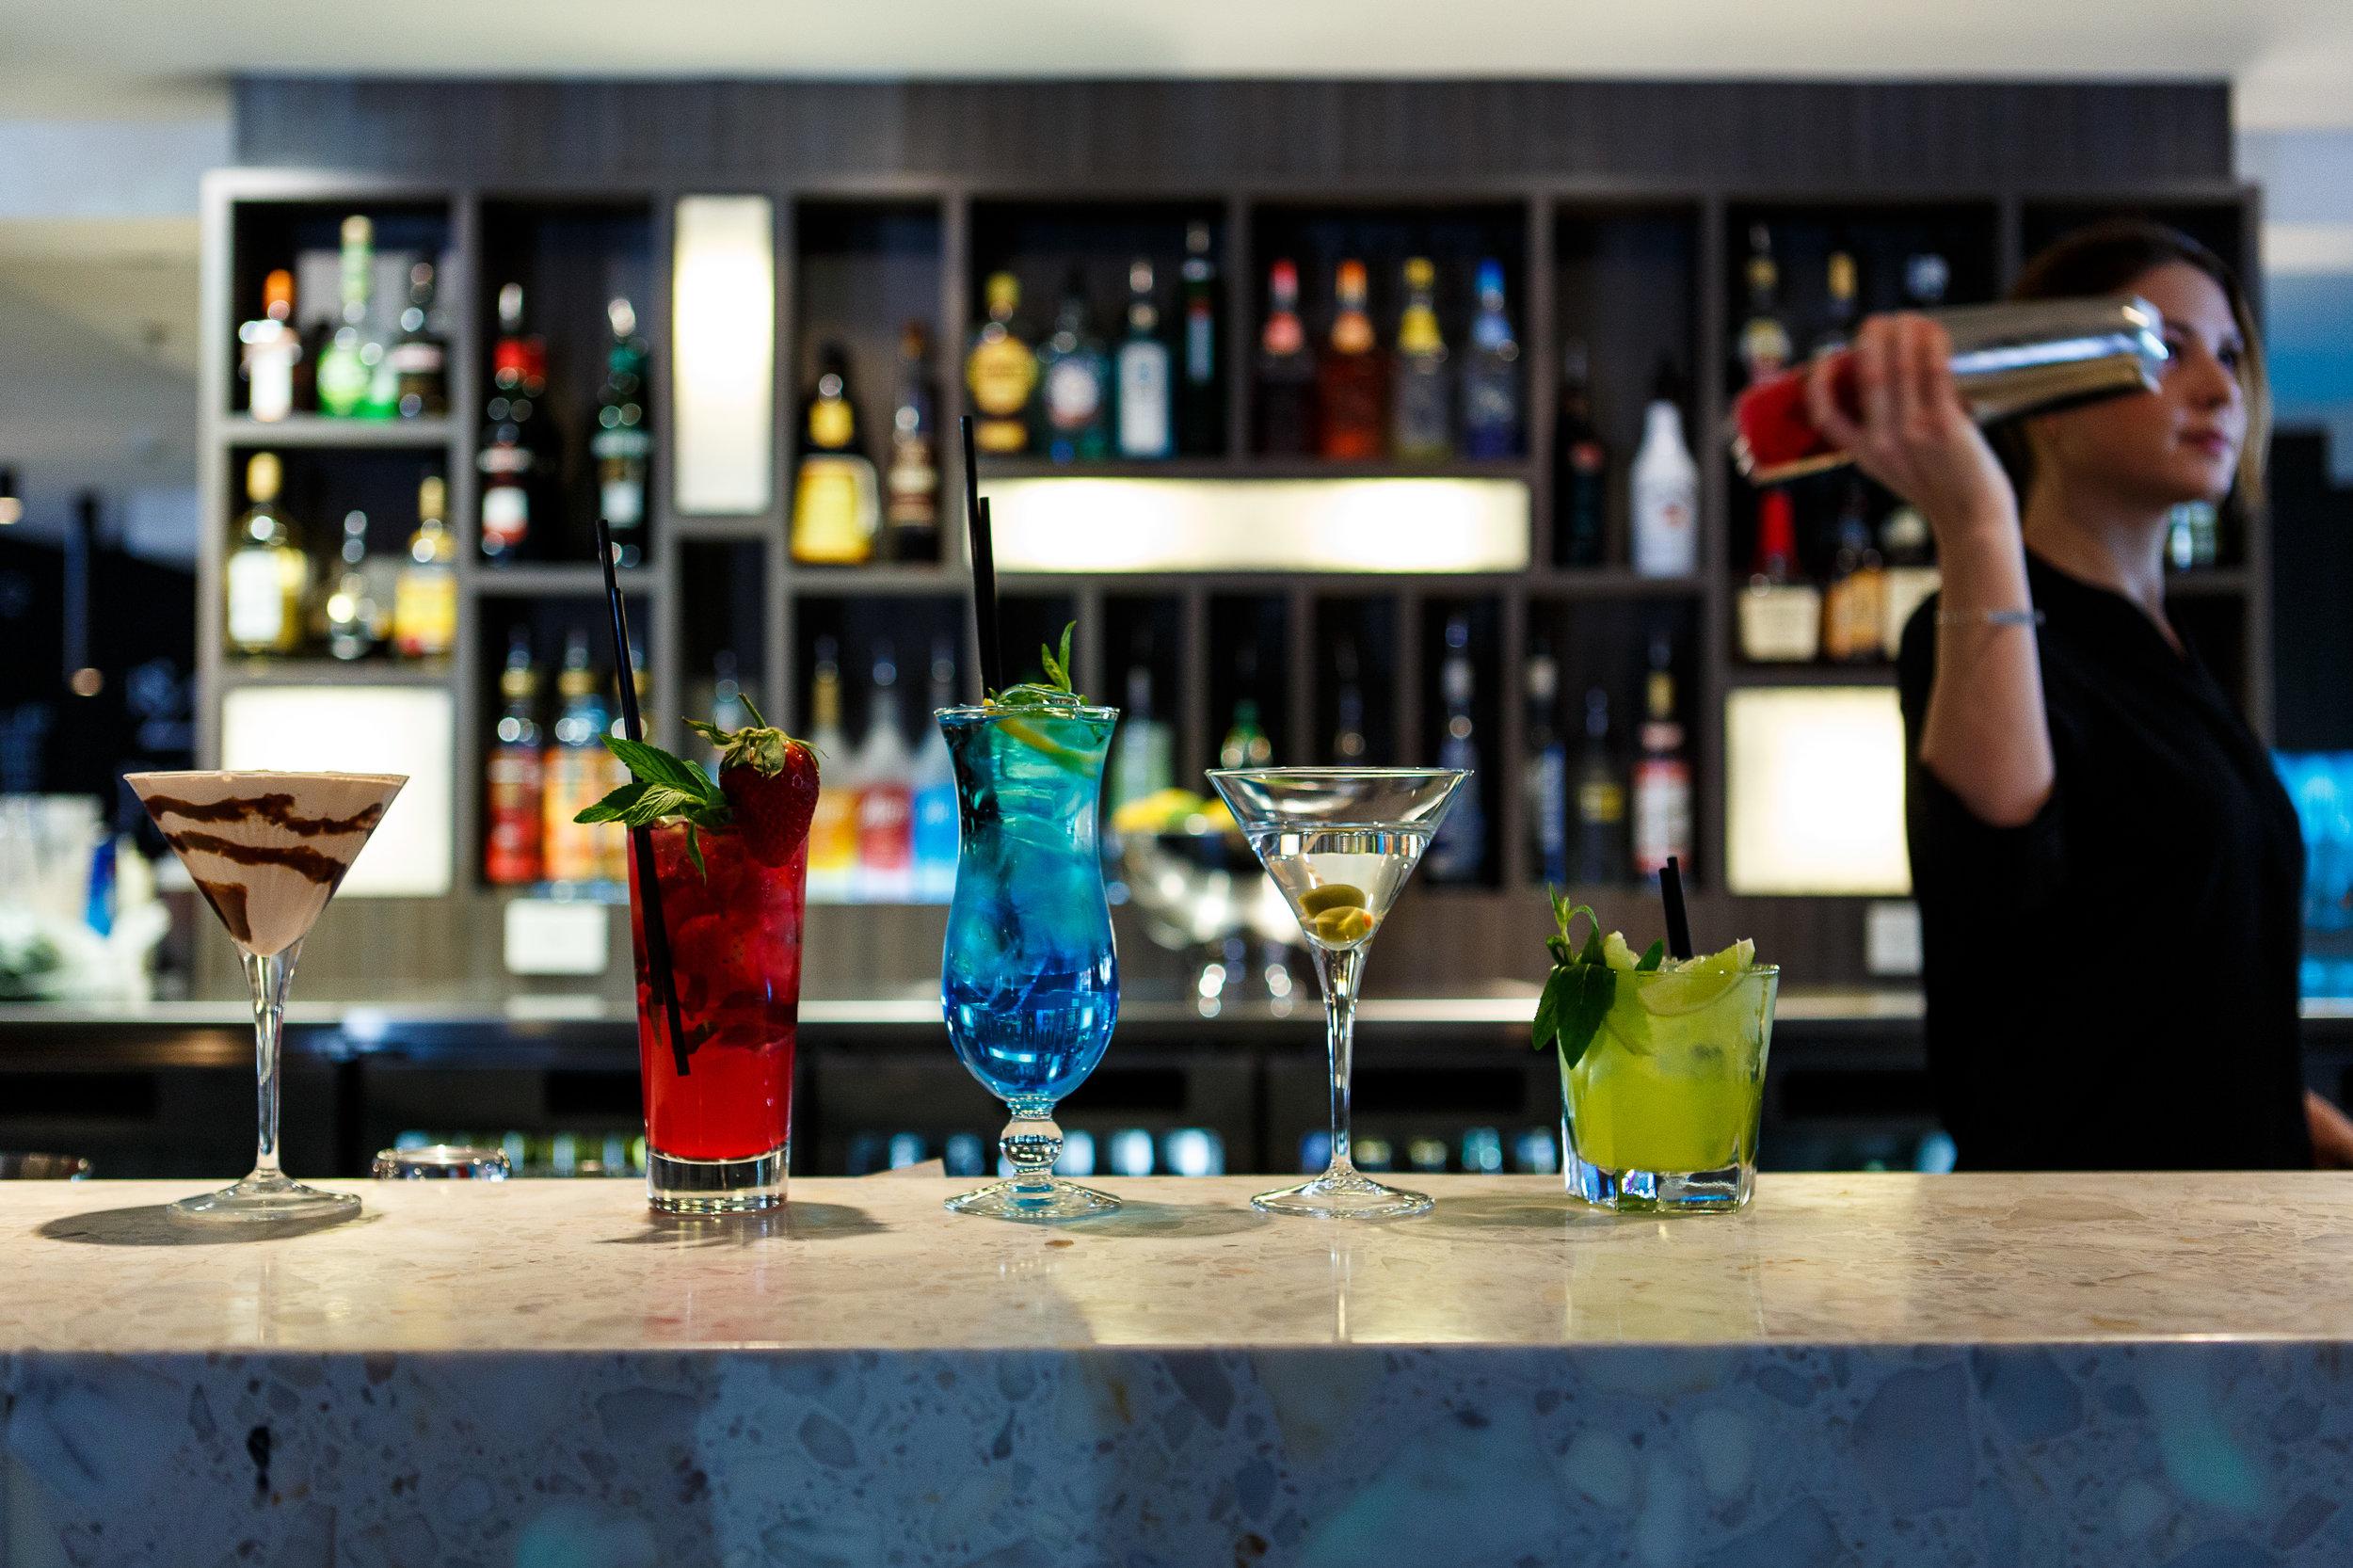 [130725-130726] The Dickson Lounge Bar (Chalk Studio) _0005 [Original].jpg